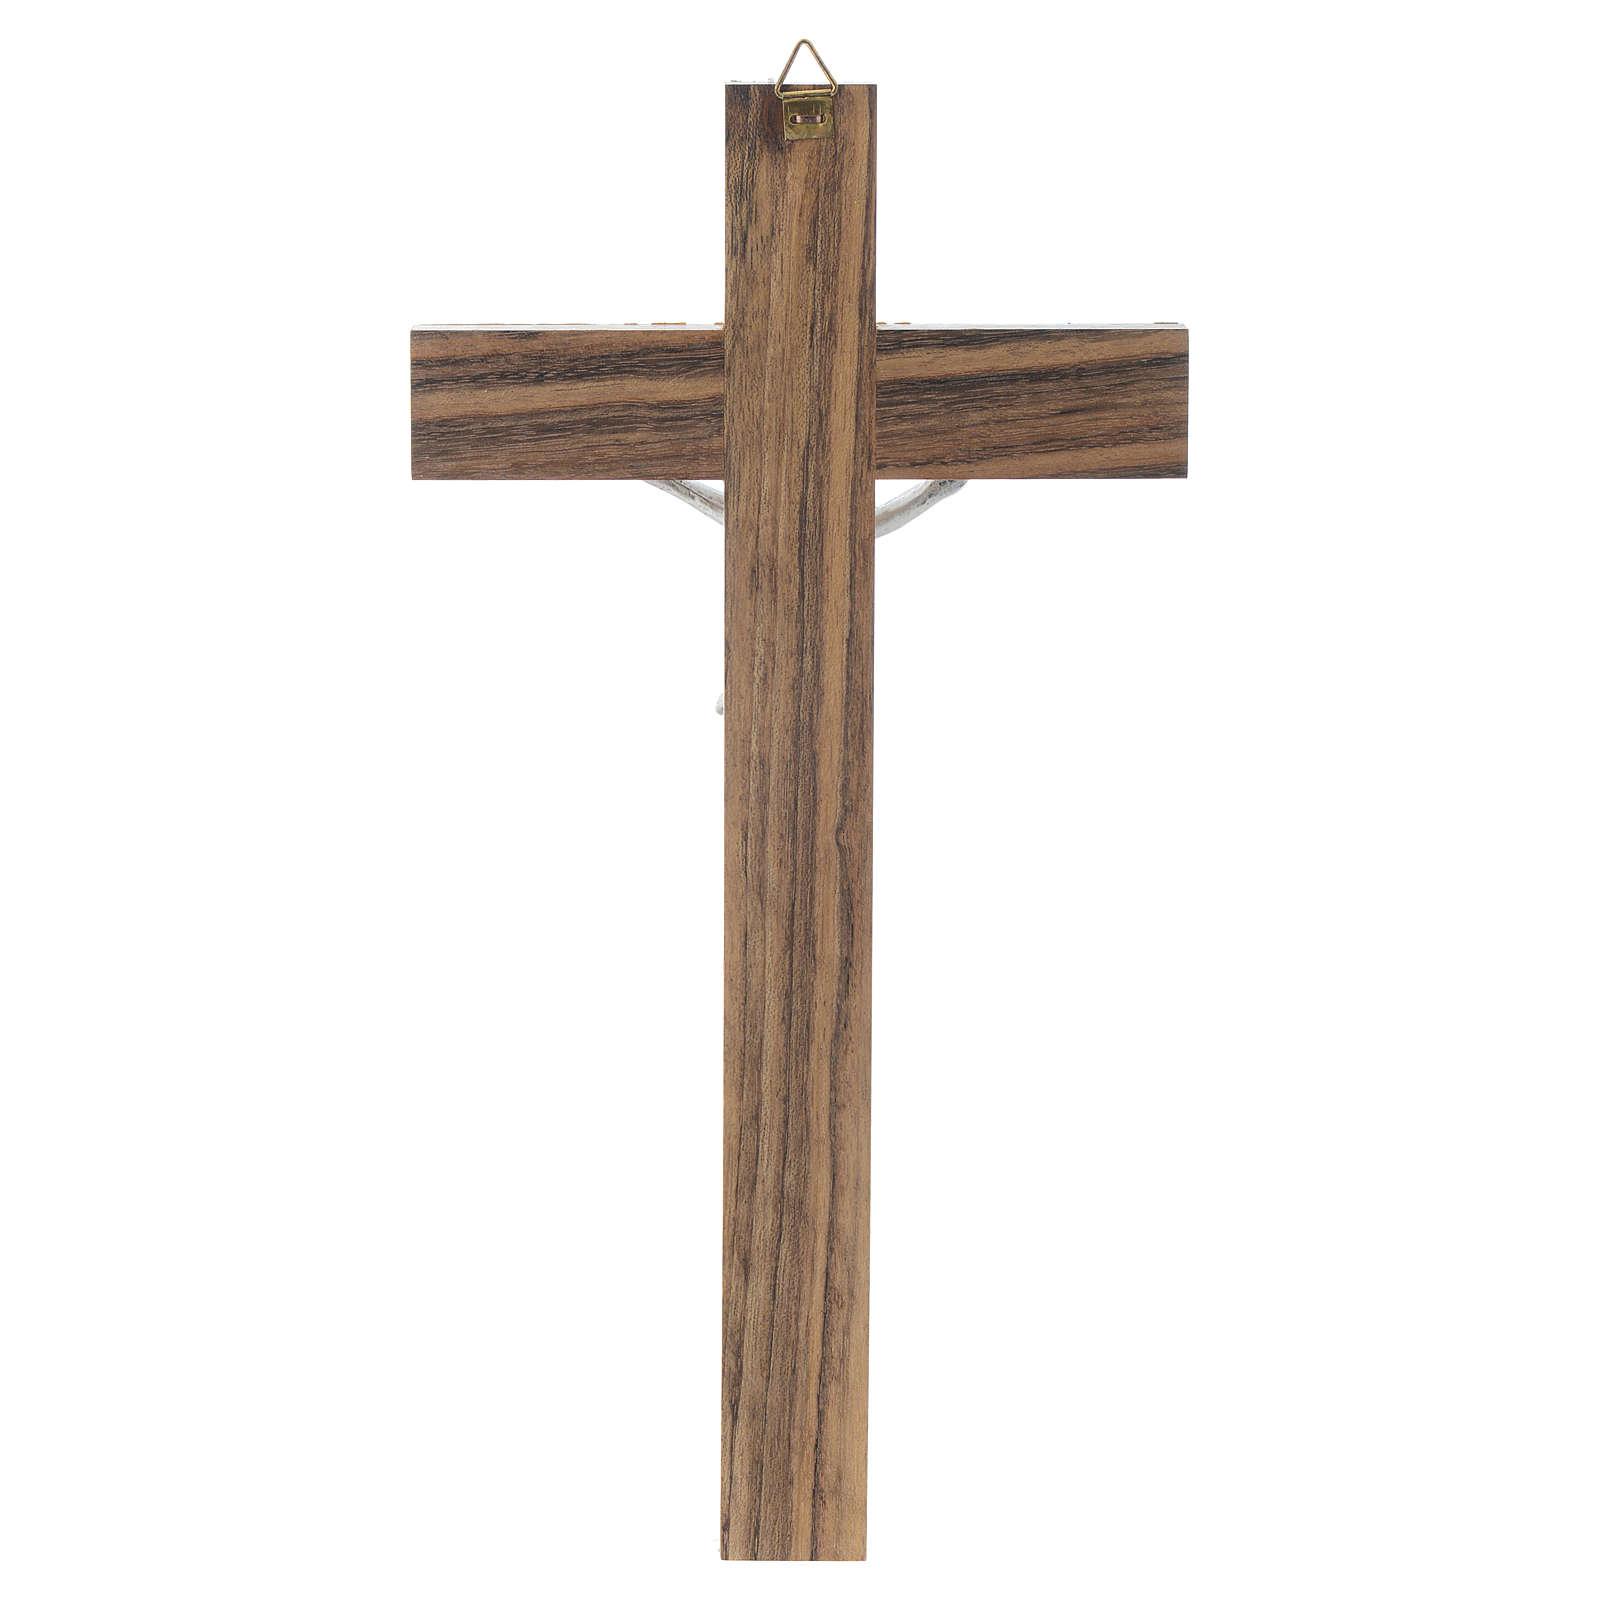 Crocefisso legno simil madreperla 4